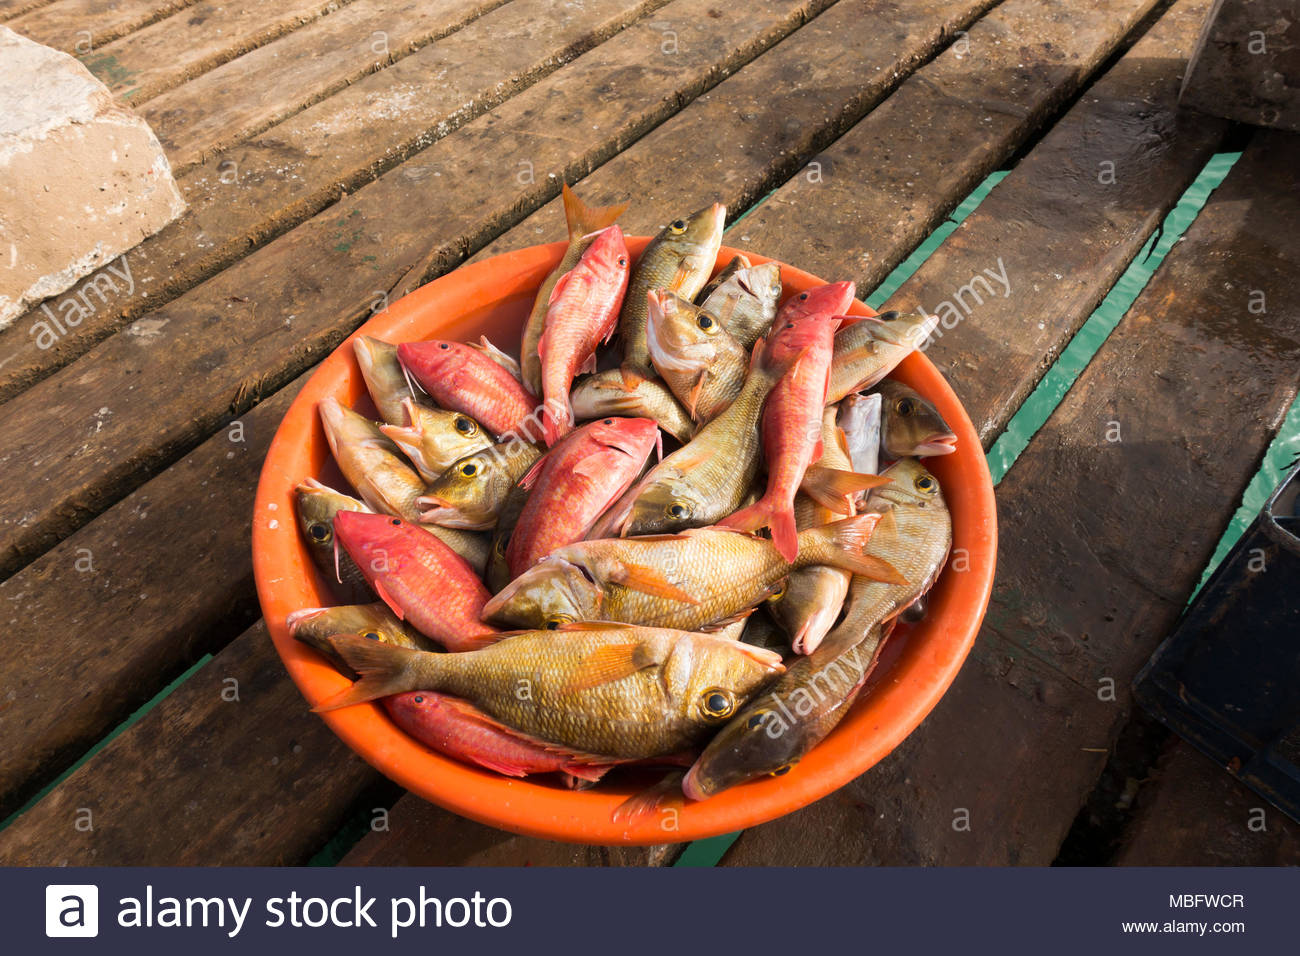 un sacco di pesce hook updati di contatto di incontri uniformi